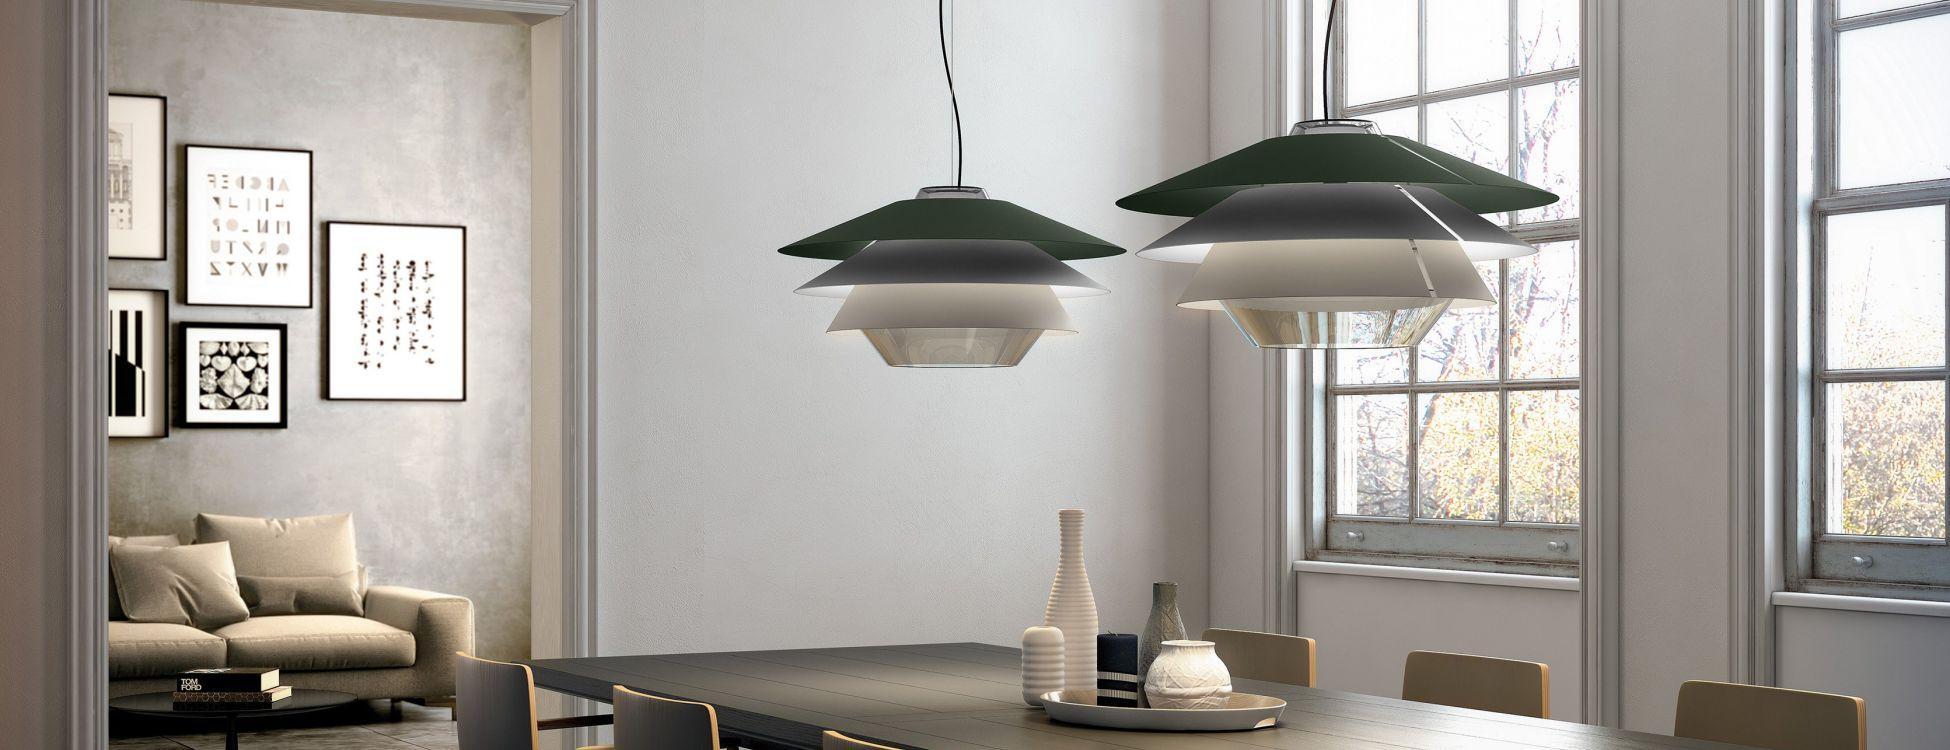 Overlay S25 Lamp Pendant Lamp G9 60W - Glass Grey